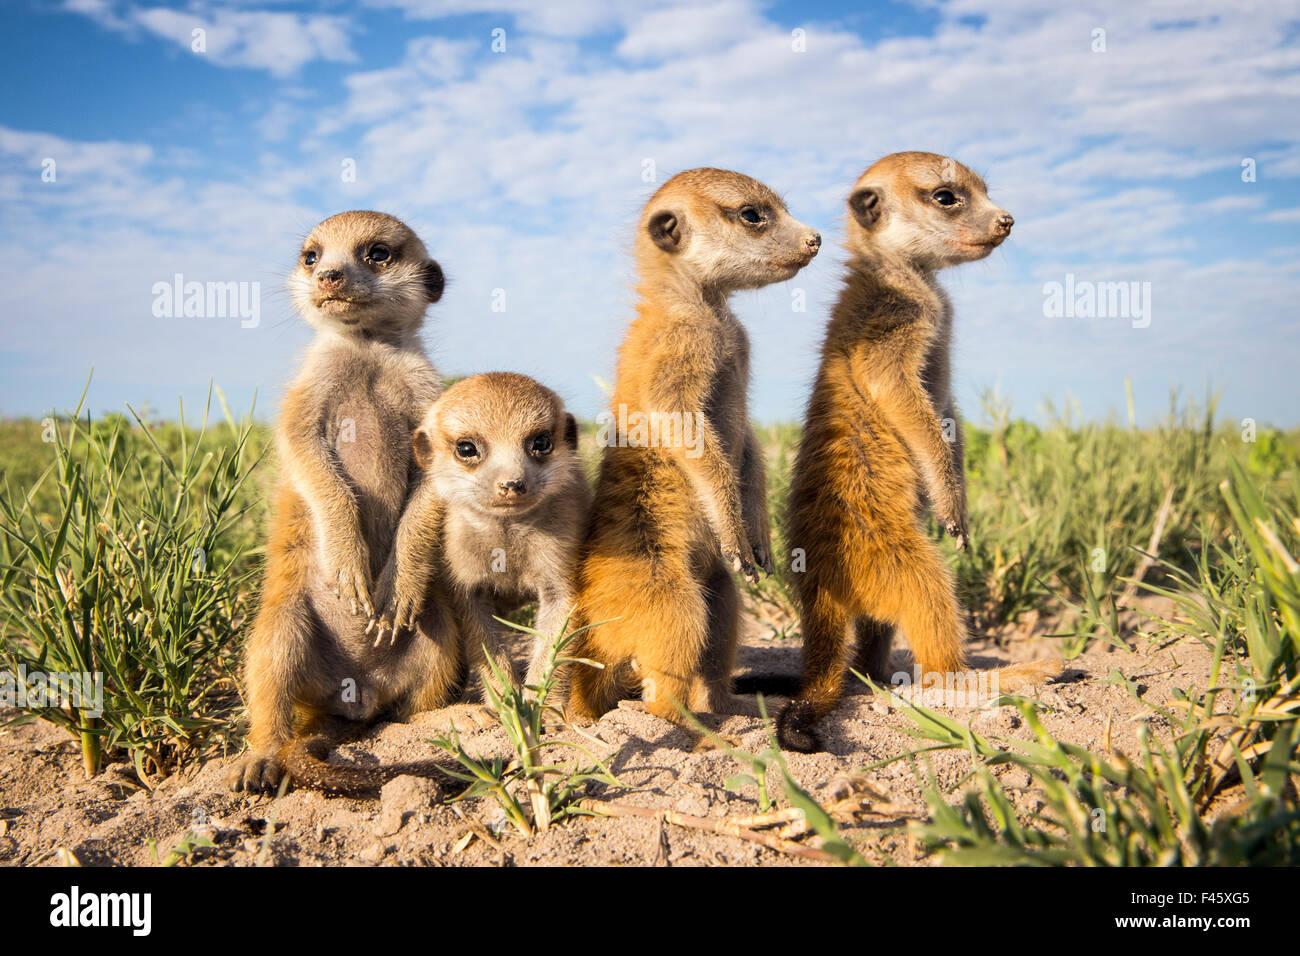 Meerkat (Suricata suricatta) gruppo di bambini, Makgadikgadi pentole, il Botswana. Immagini Stock